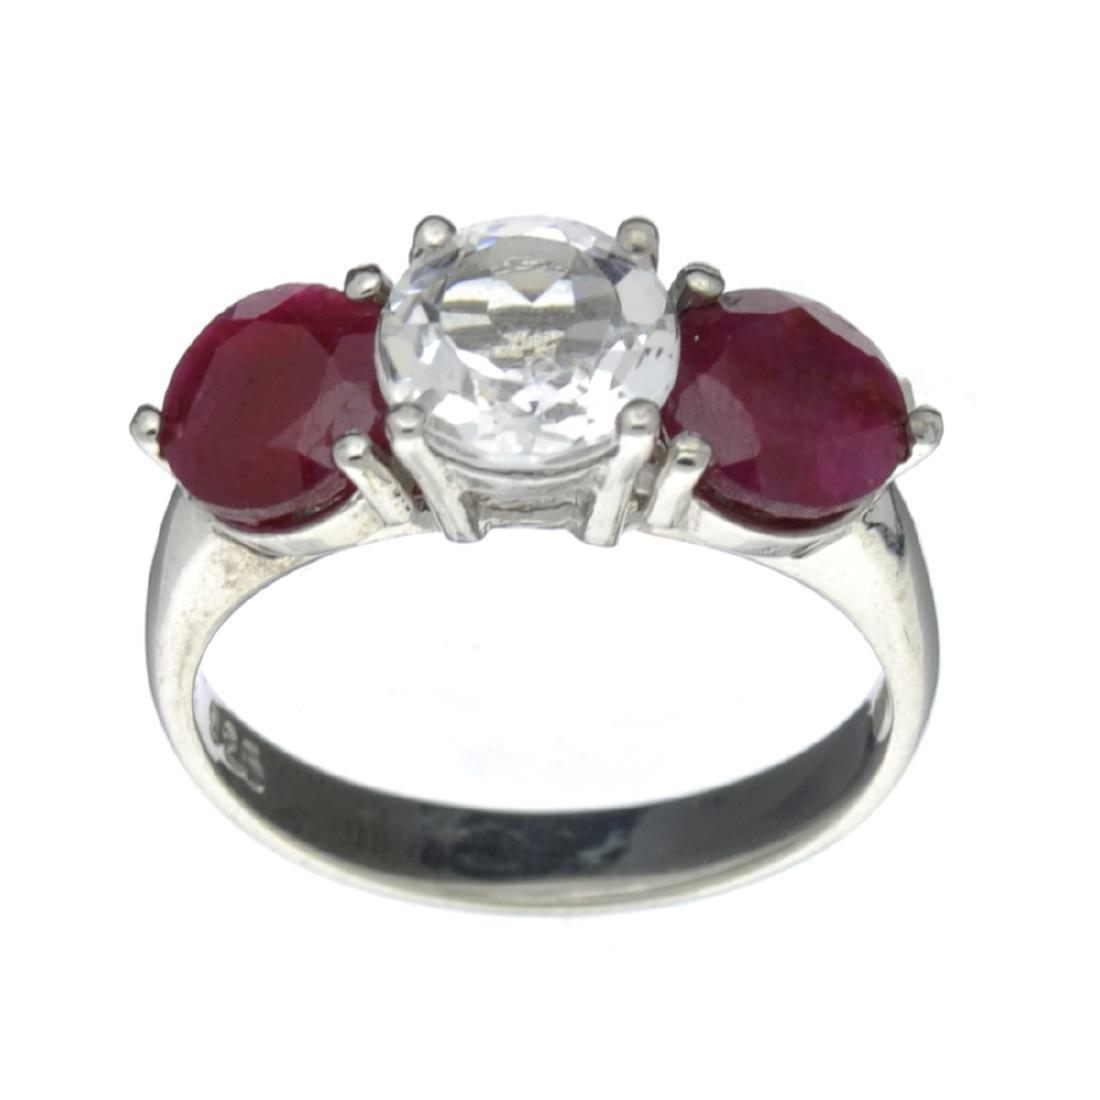 APP: 0.6k Fine Jewelry Designer Sebastian, 3.81CT Ruby